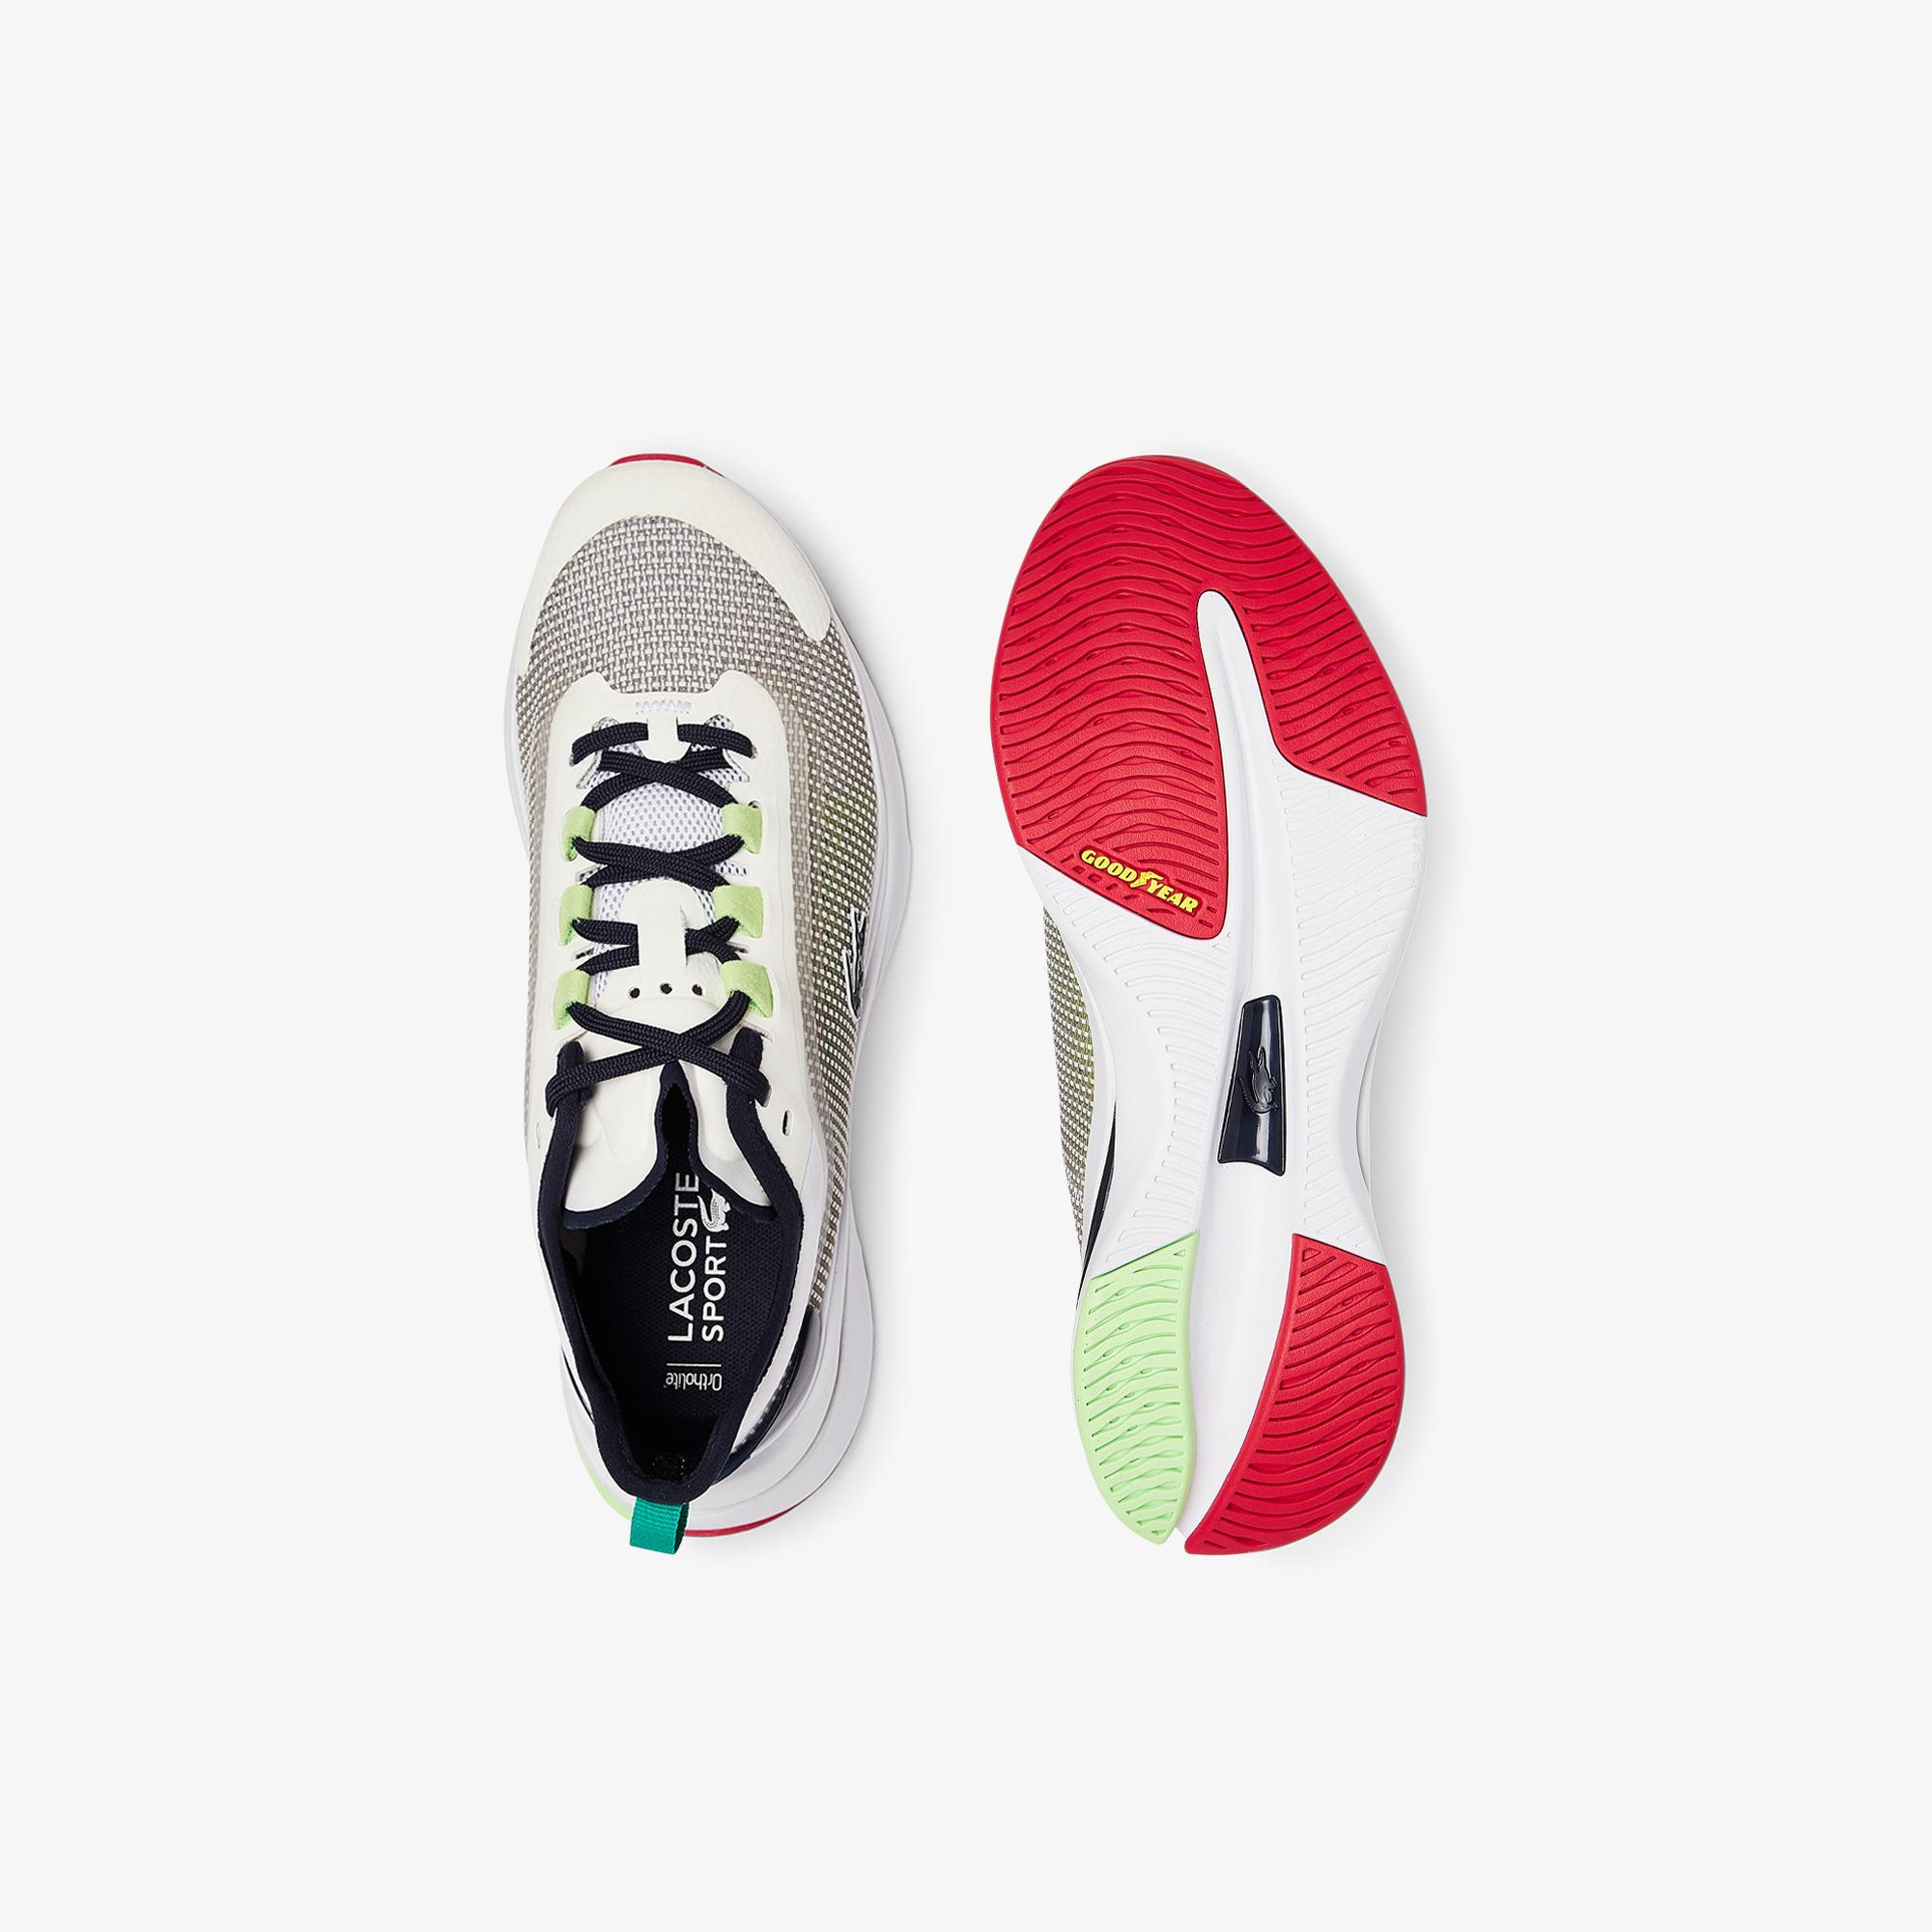 Lacoste кросівки жіночі Run Spin